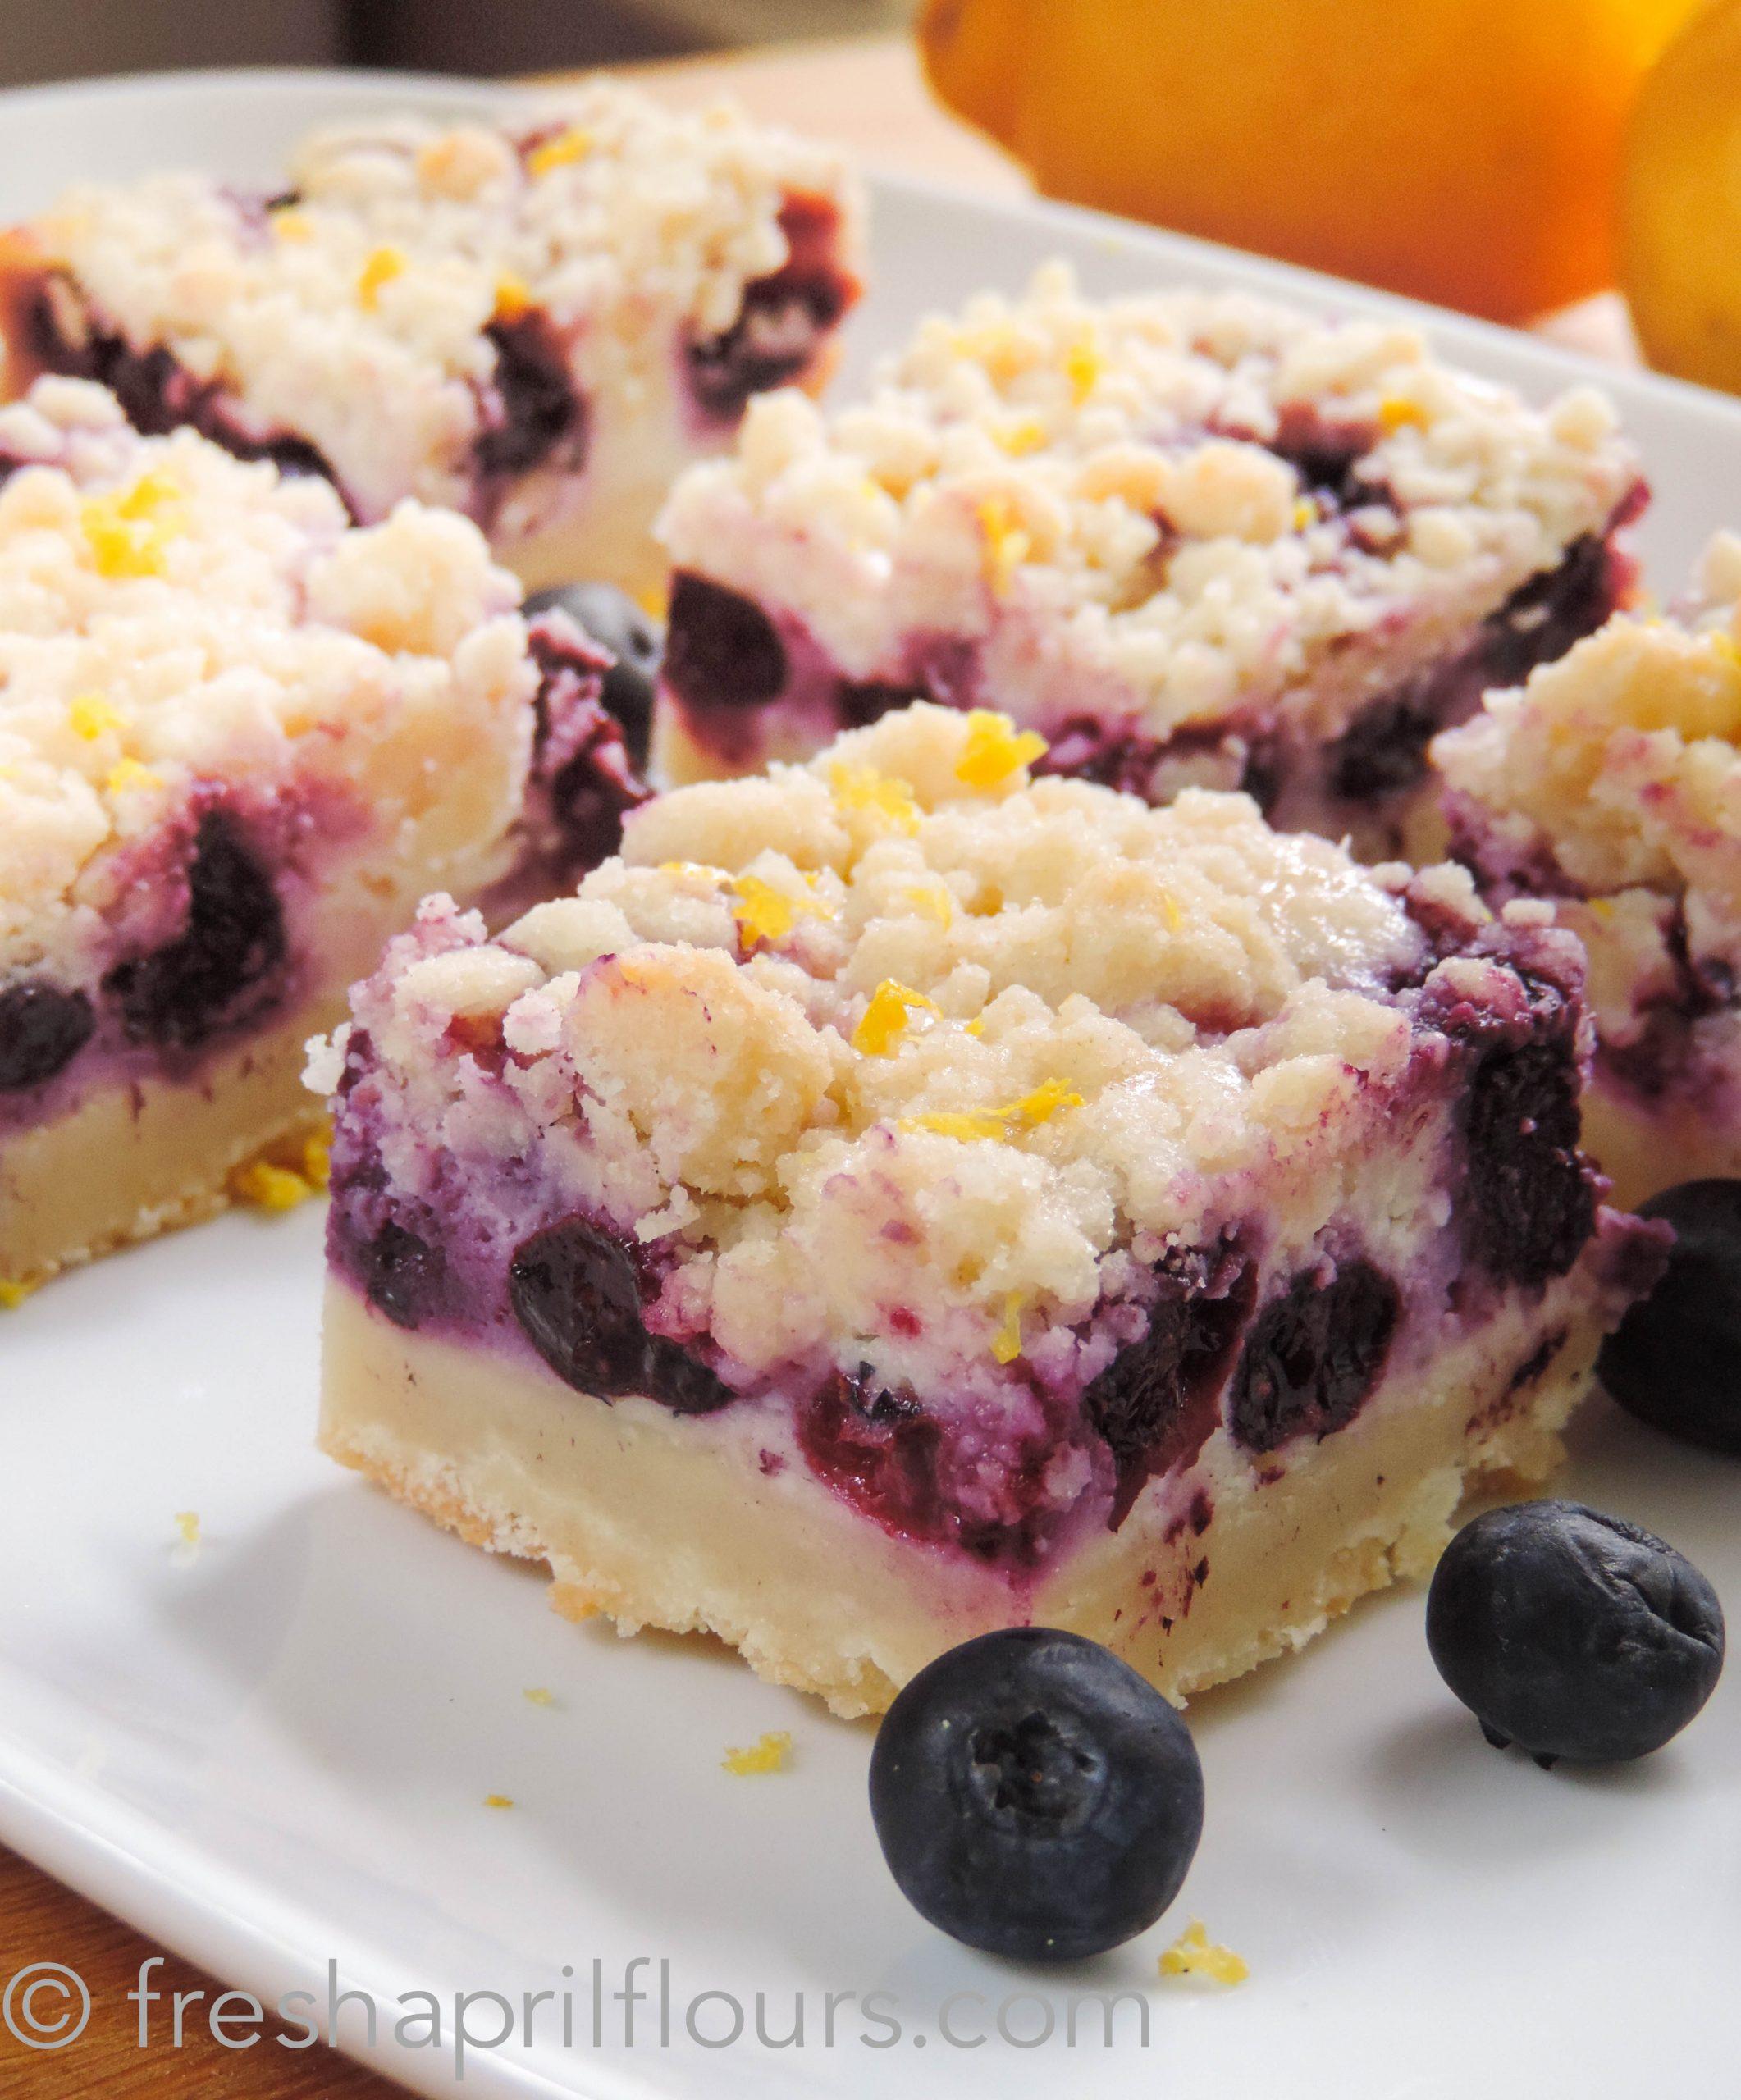 blueberry lemon pie bars on a plate